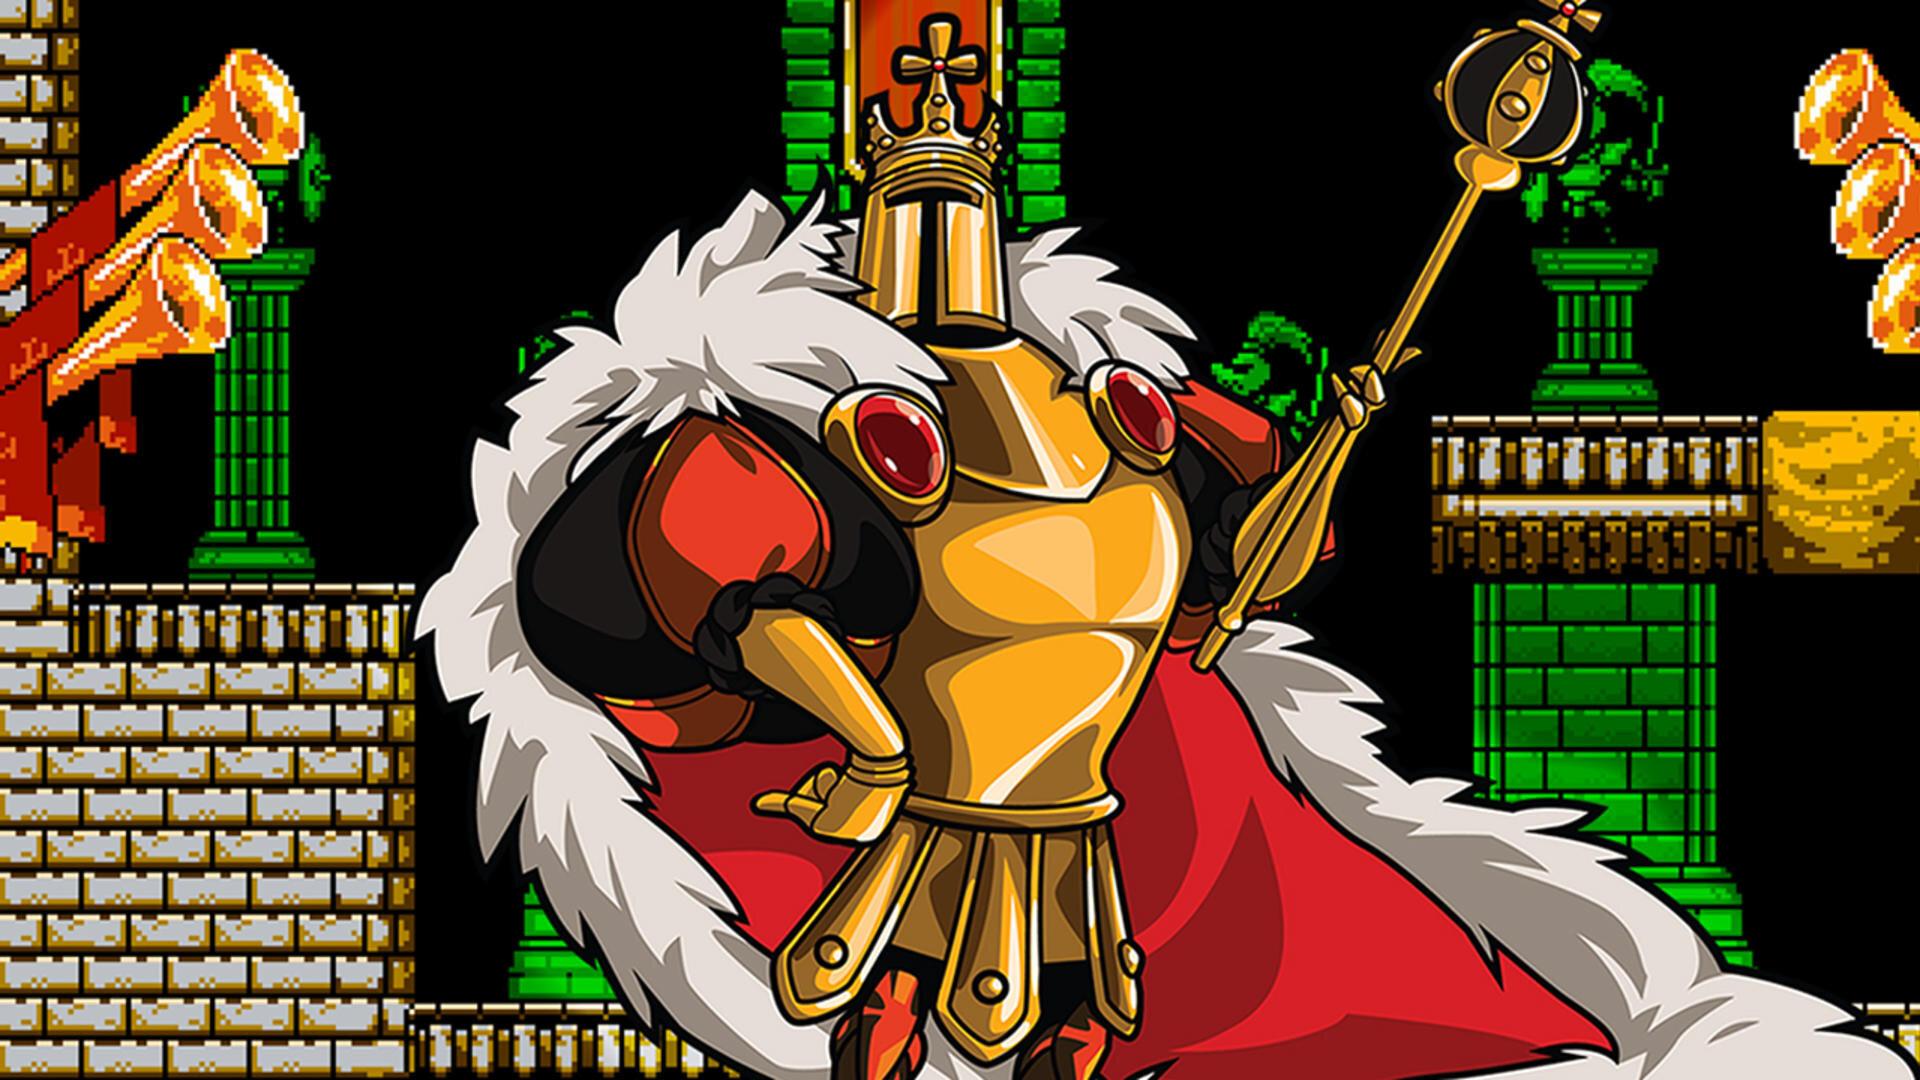 Shovel Knight King Of Cards Review Darkstation Armor, upgrade, shovel, relic, chalice, hp, mana up, and at tower of fate: shovel knight king of cards review